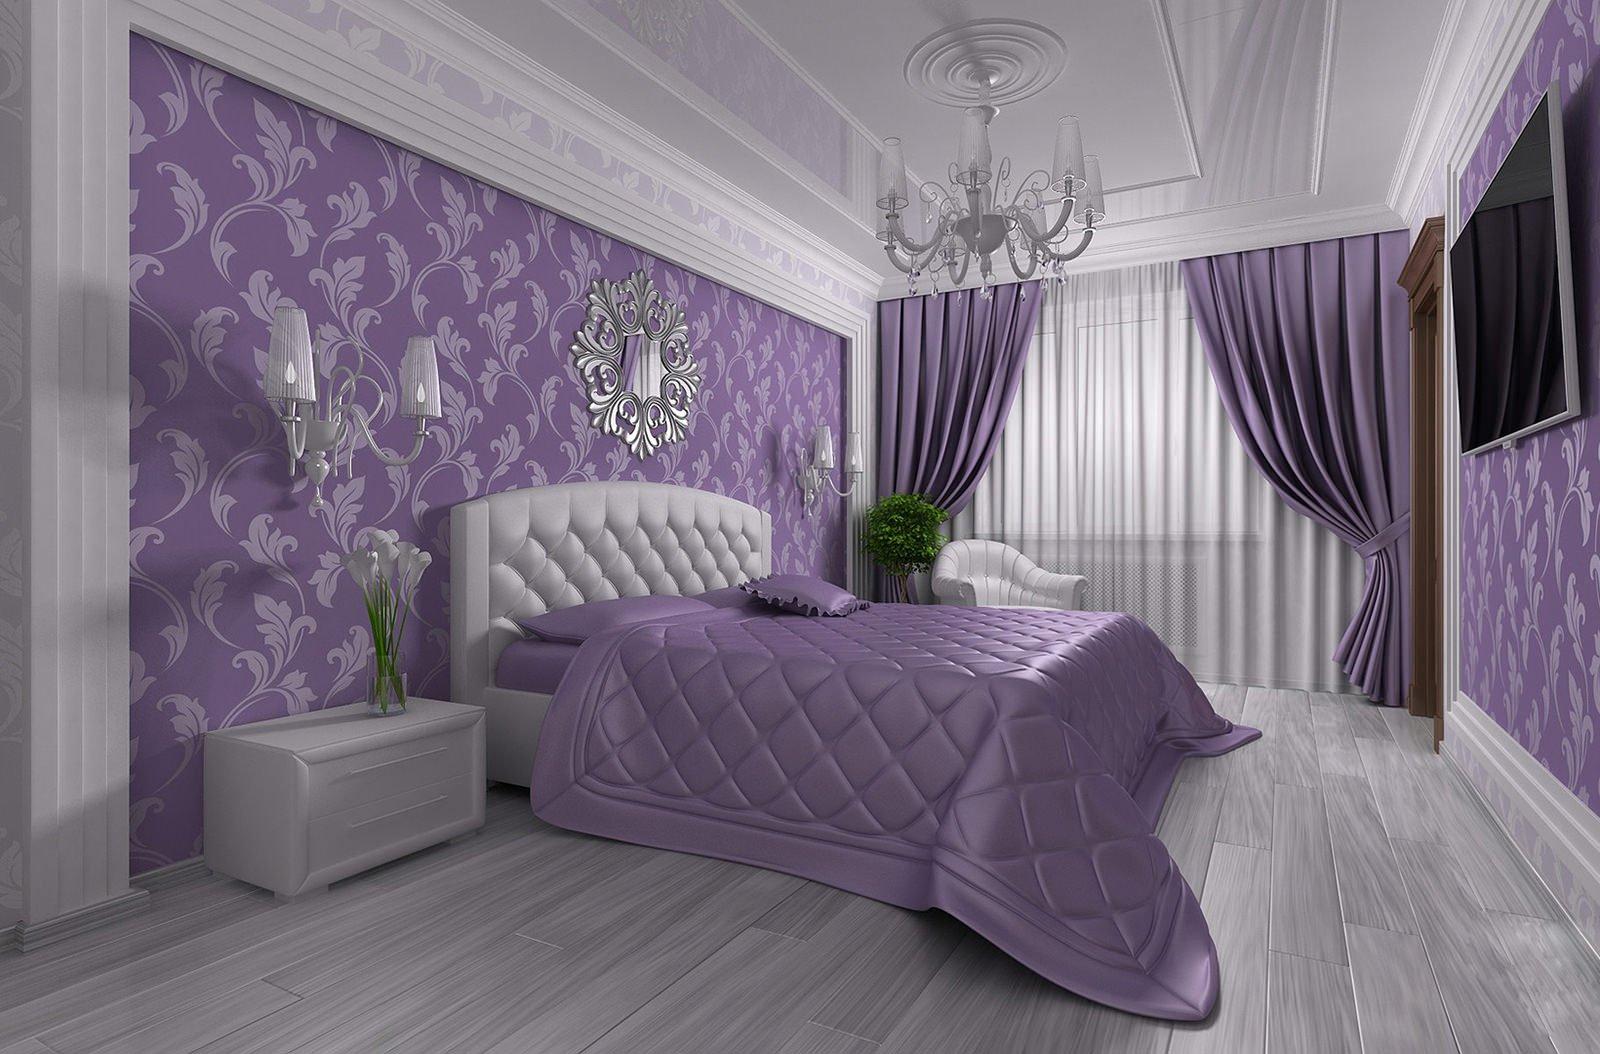 Шикарный интерьер спальни